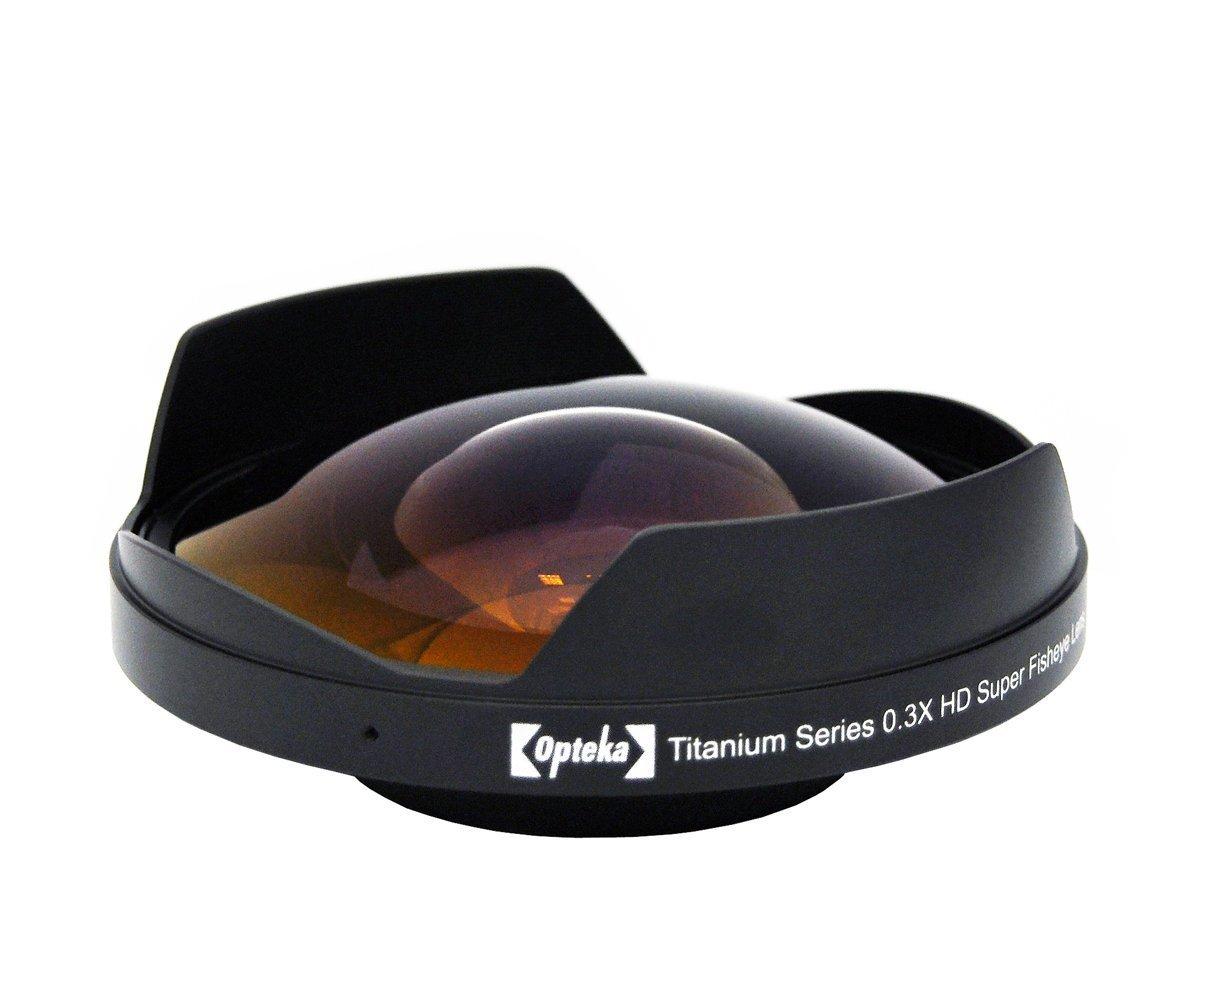 Opteka OPT-SC58FE Titanium Series 58mm 0.3X HD Super Fisheye Lens for Professional Video Camcorders